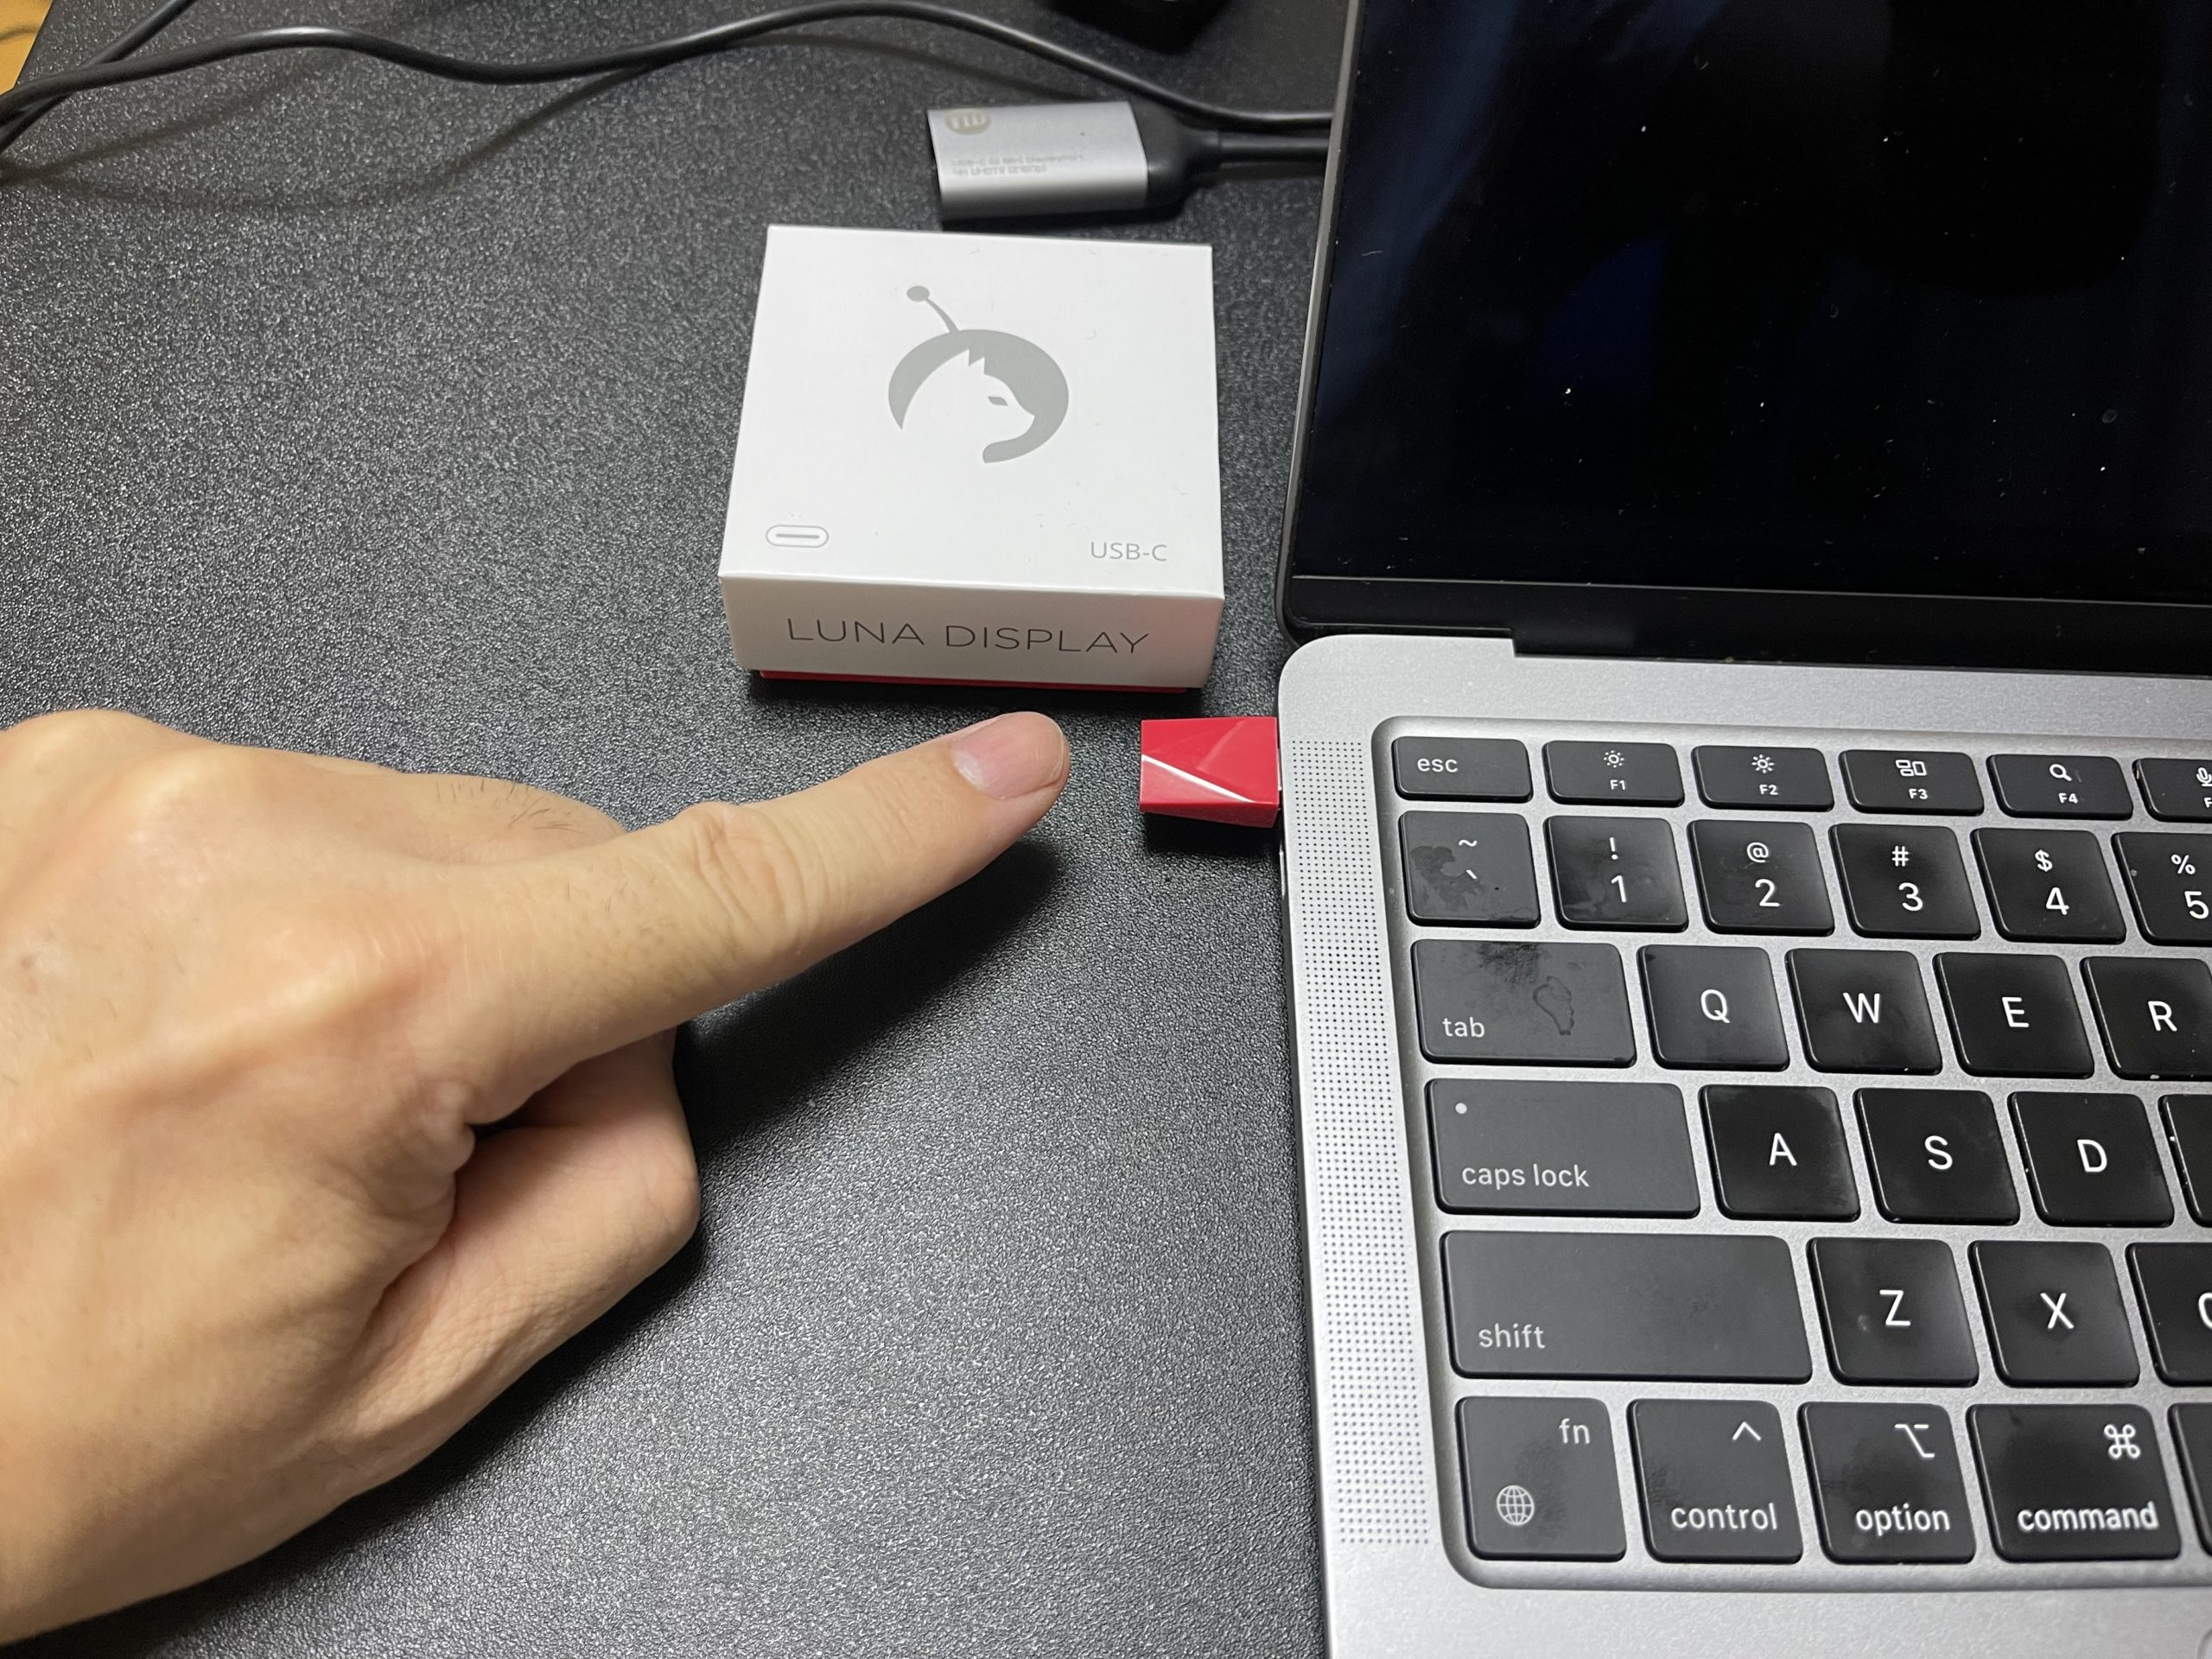 luna display connect